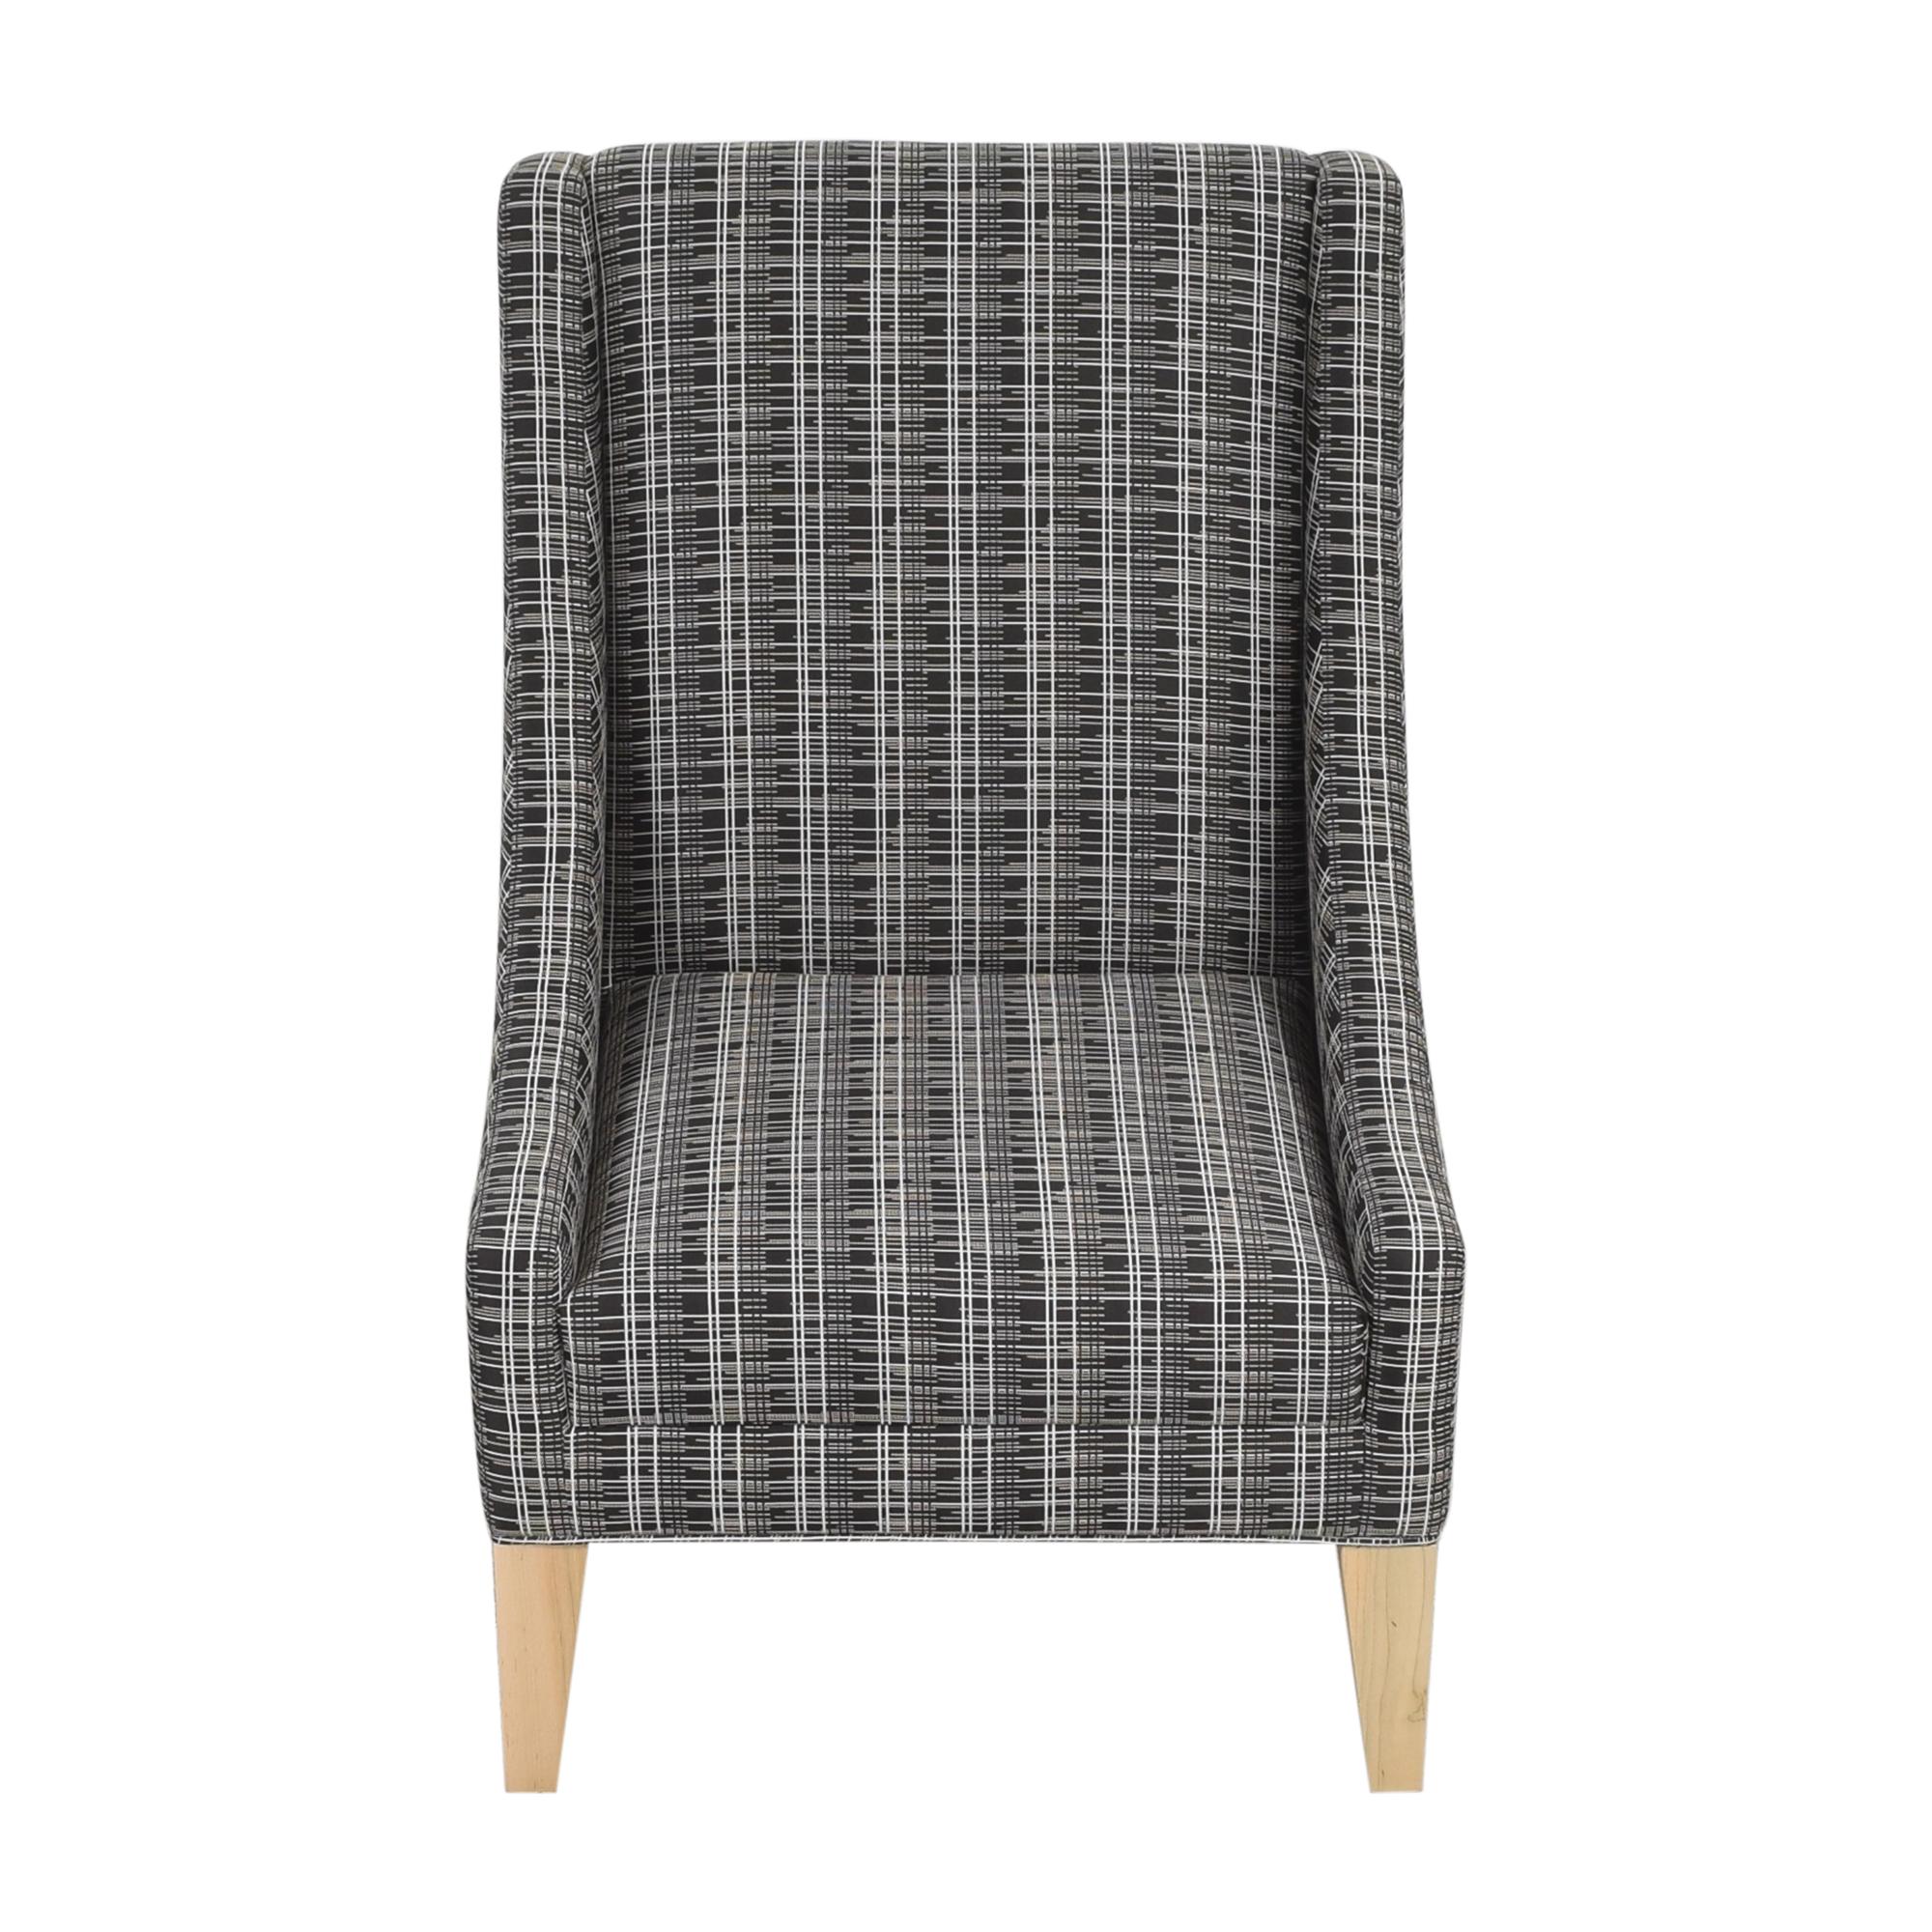 Global Furniture Group Global Furniture Group Vitrola High Back Lounge Chair  ct